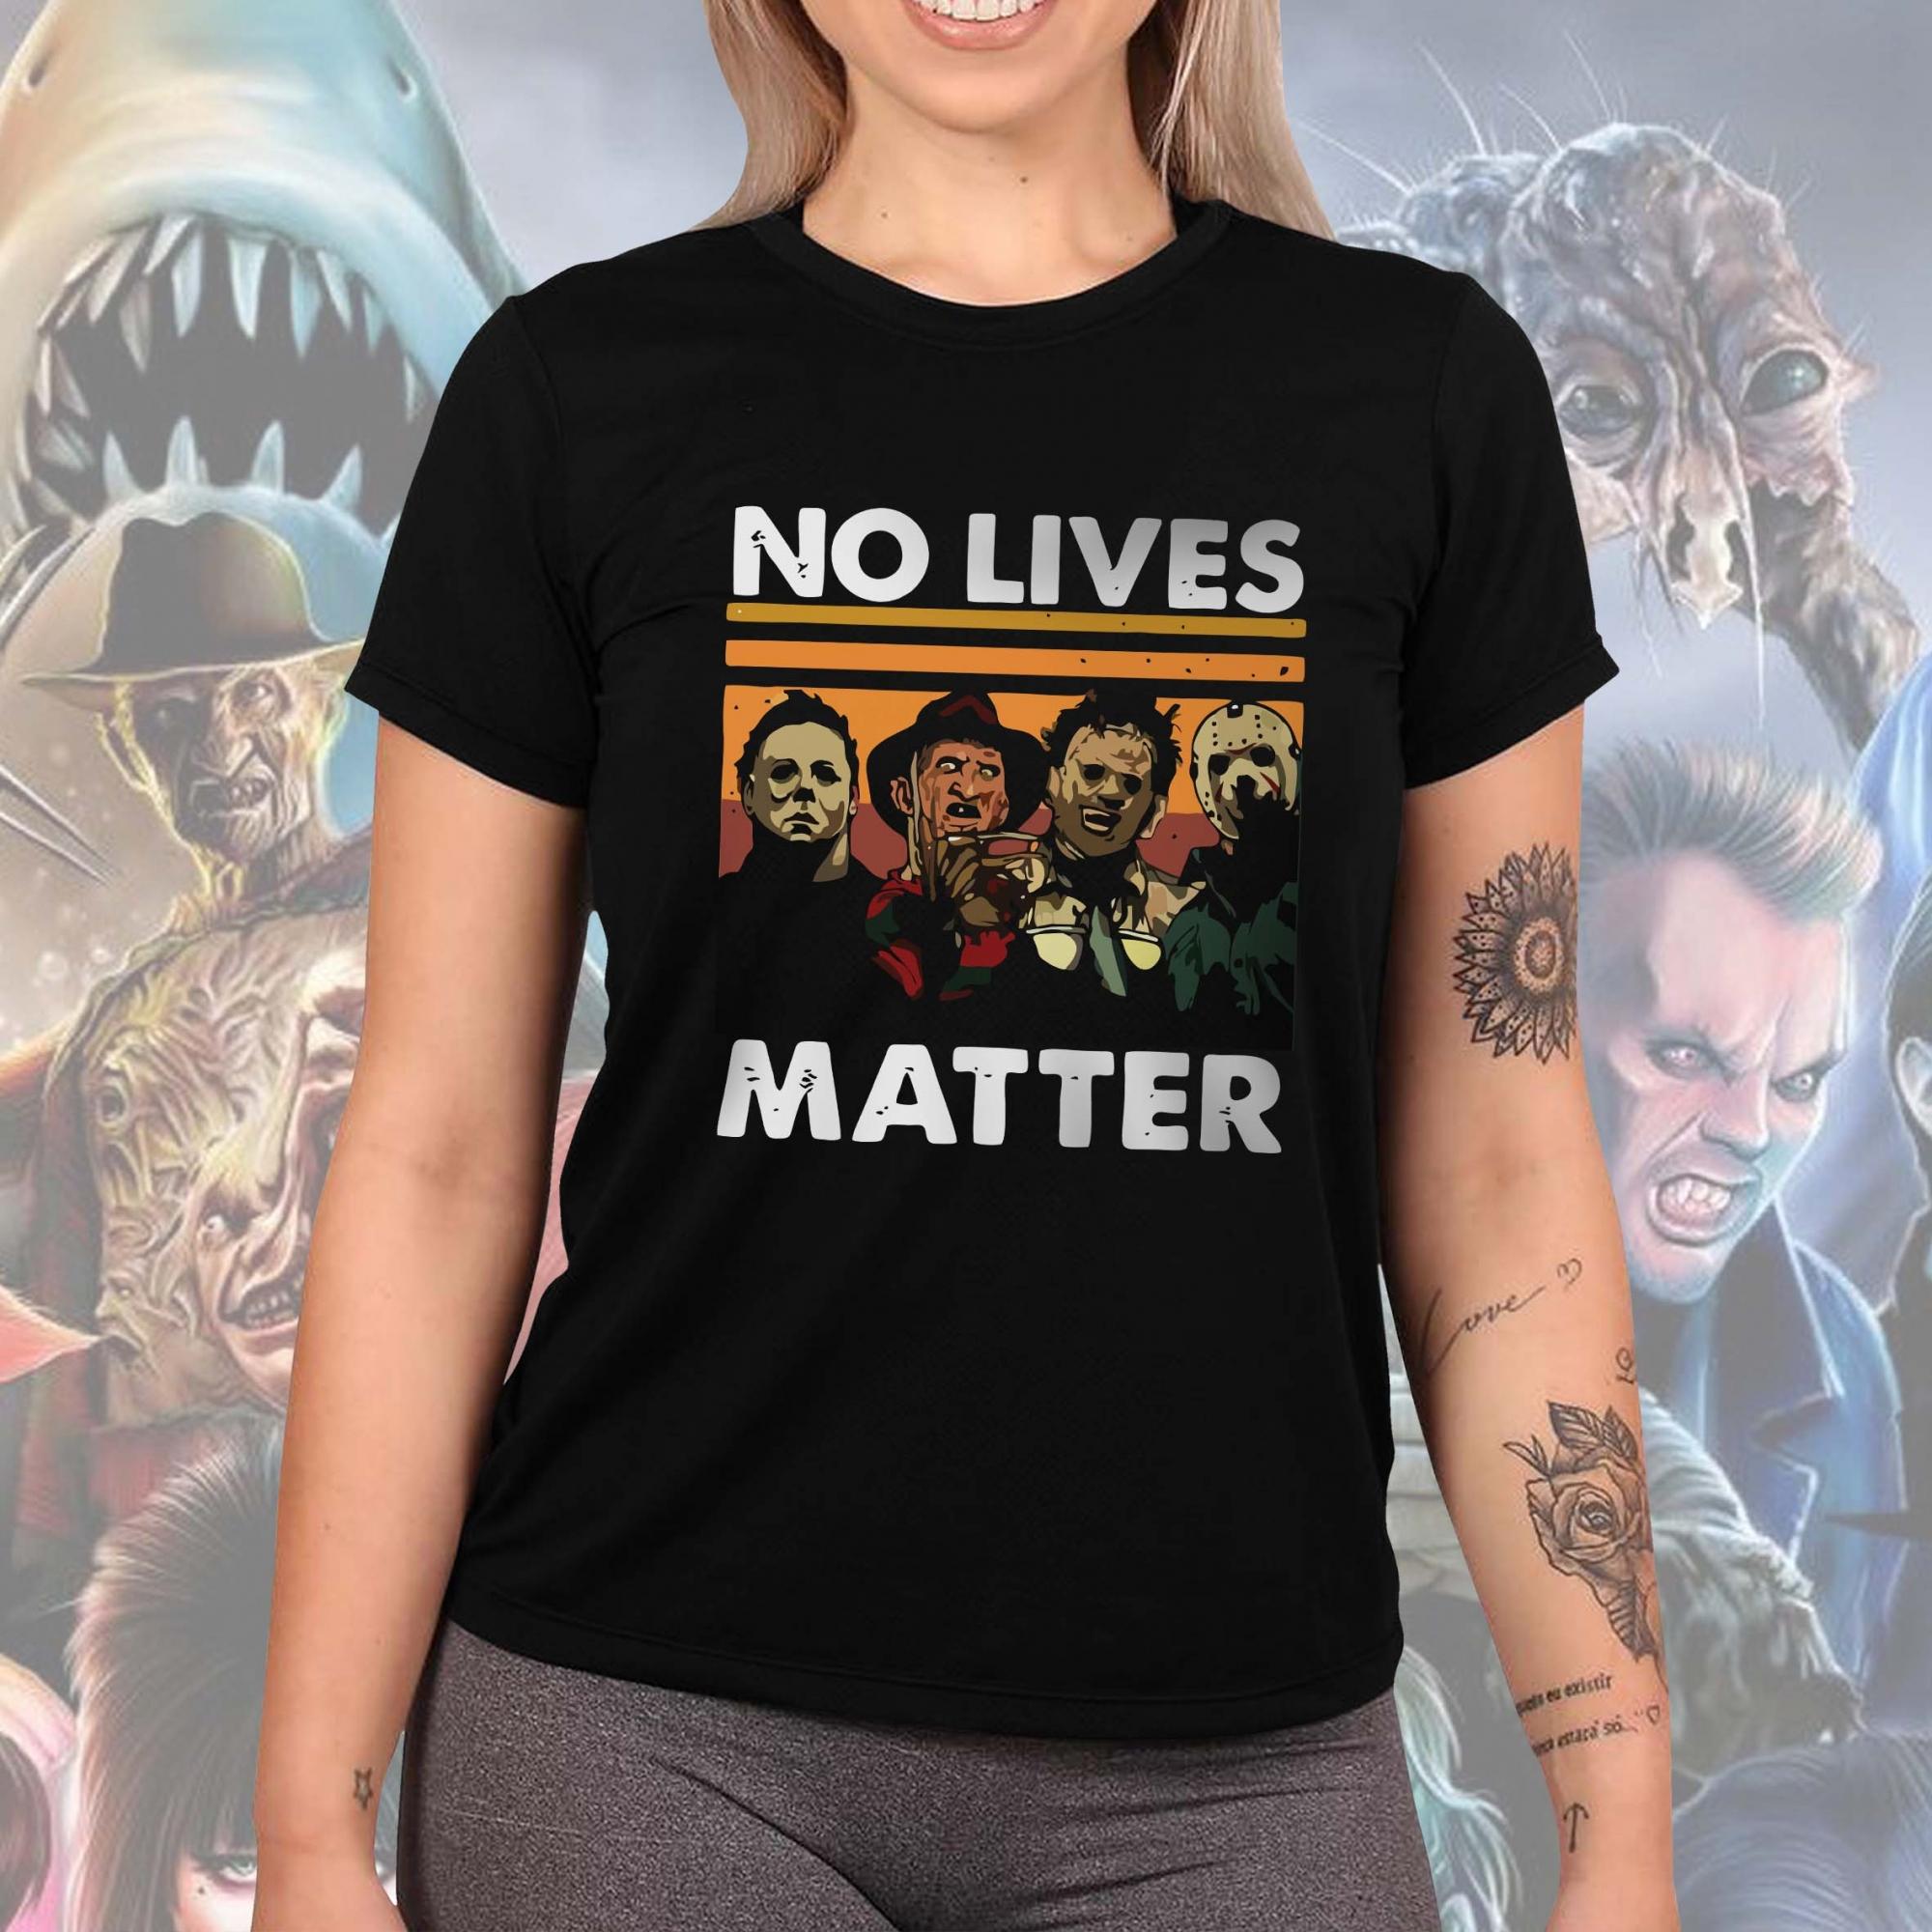 Camiseta Feminina Unissex No Lives Matter Horror Michael Myers Freddy Krueger Leatherface Jason Voorhees Halloween (Preta) - EV